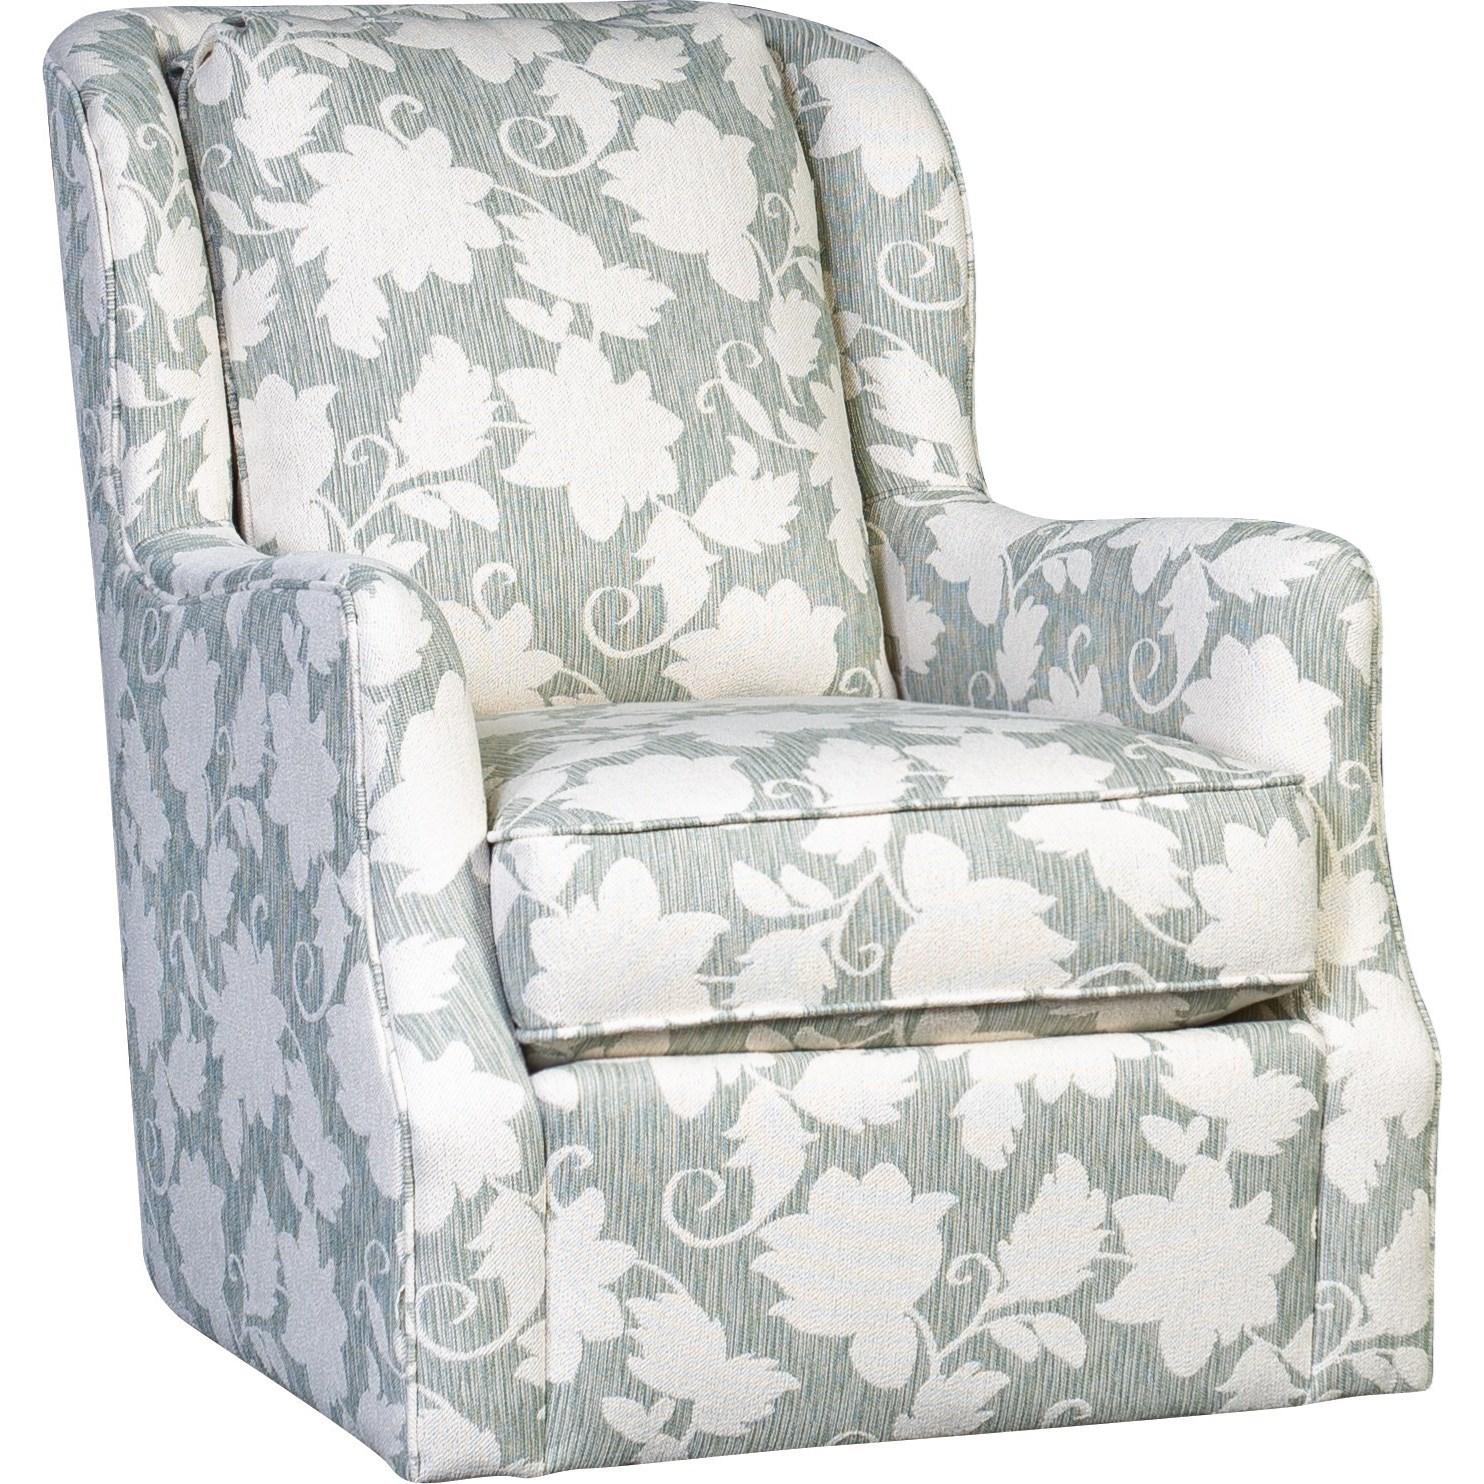 5656 Swivel Chair by Mayo at Pedigo Furniture